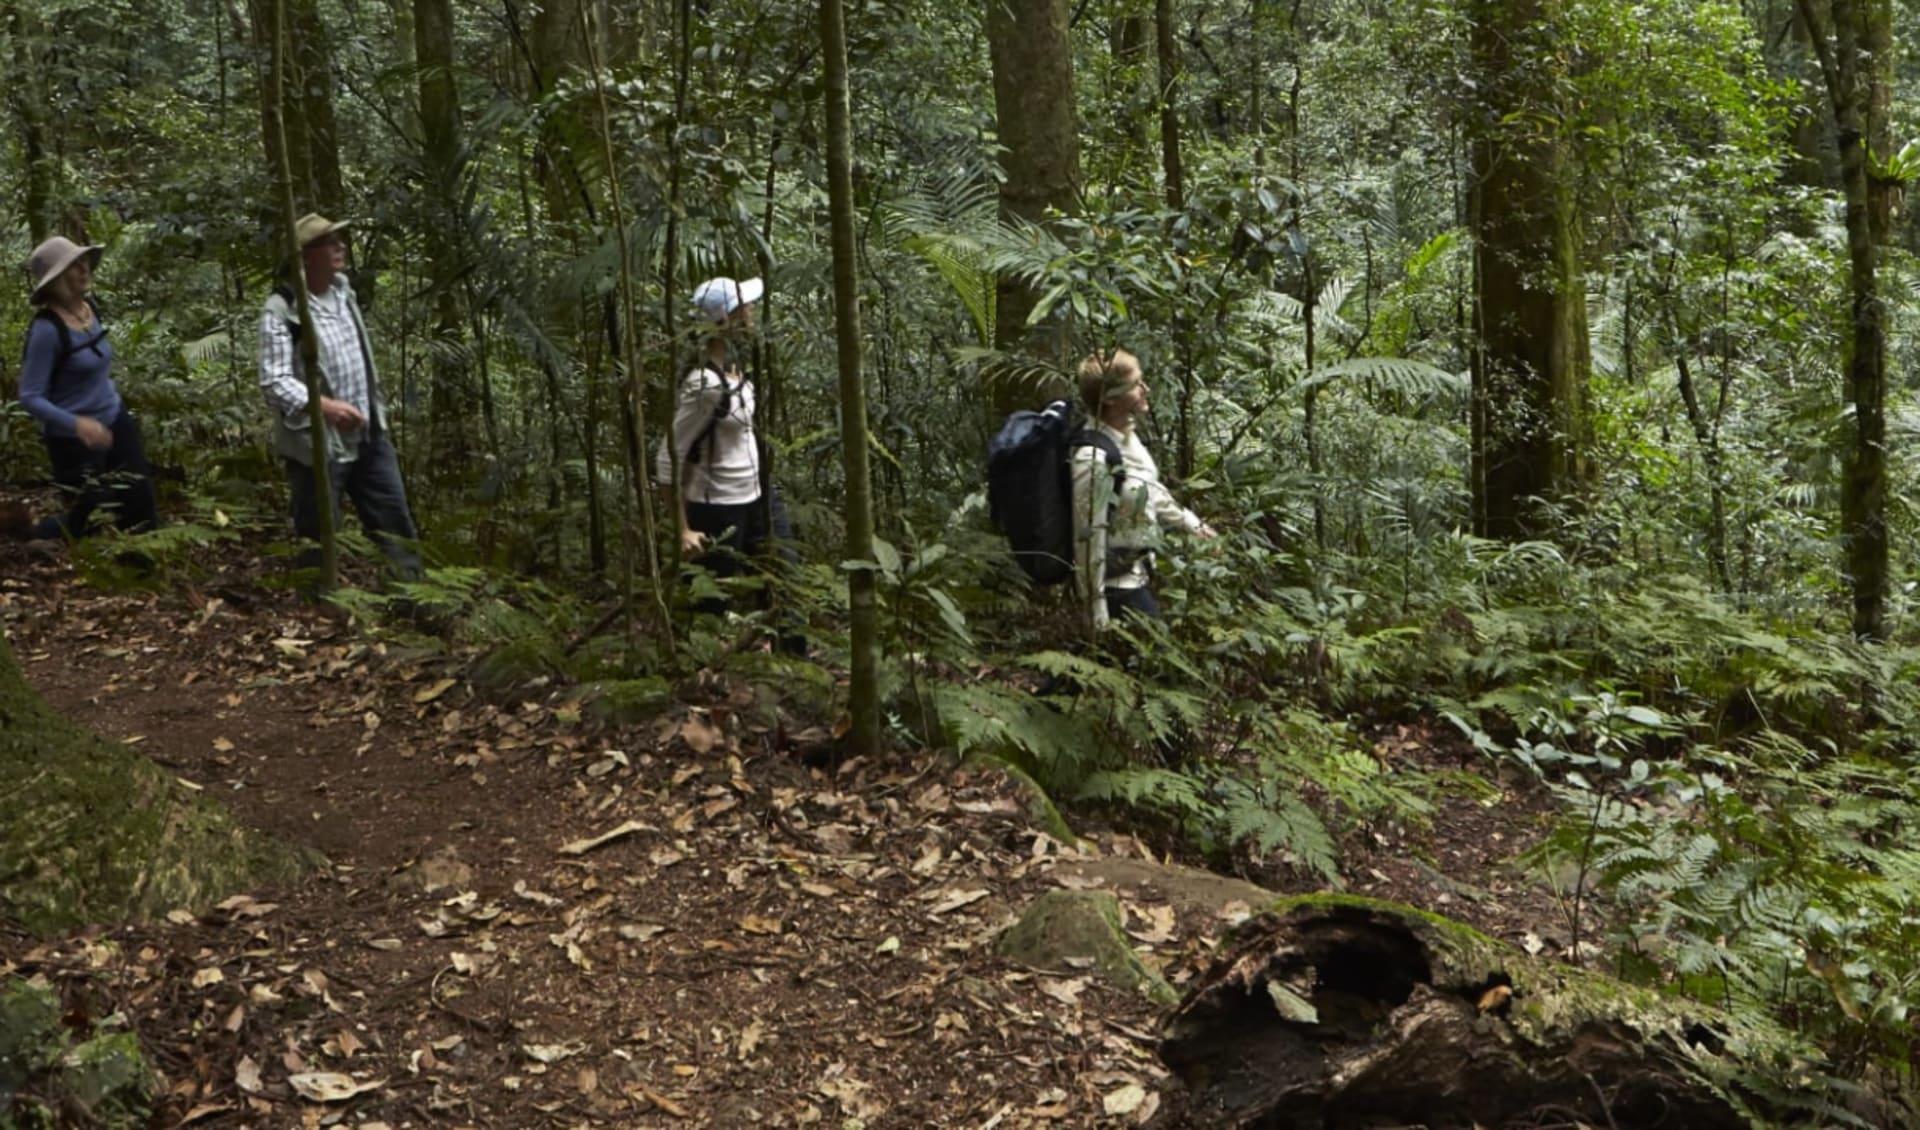 Scenic Rim Trail ab Brisbane: Australia - Queensland - Scenic Rim Trail - Urwald